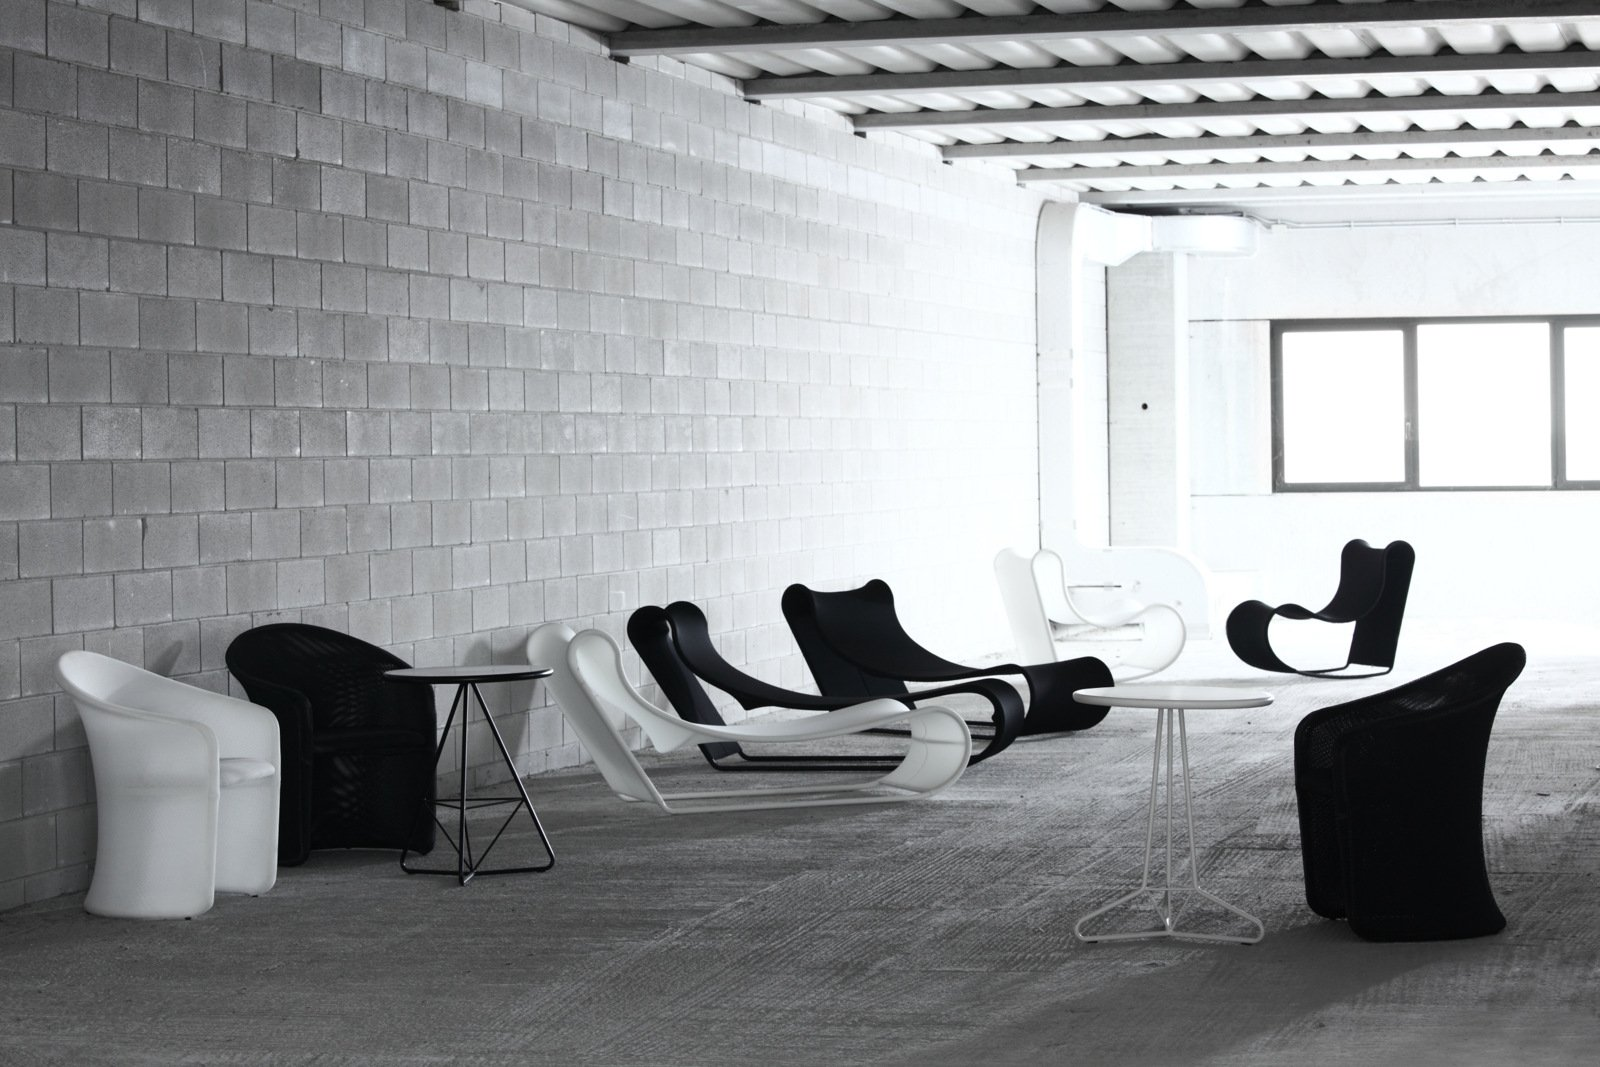 Chaise longue letto da giardino in tessuto tecnico - Chaise longue giardino ...